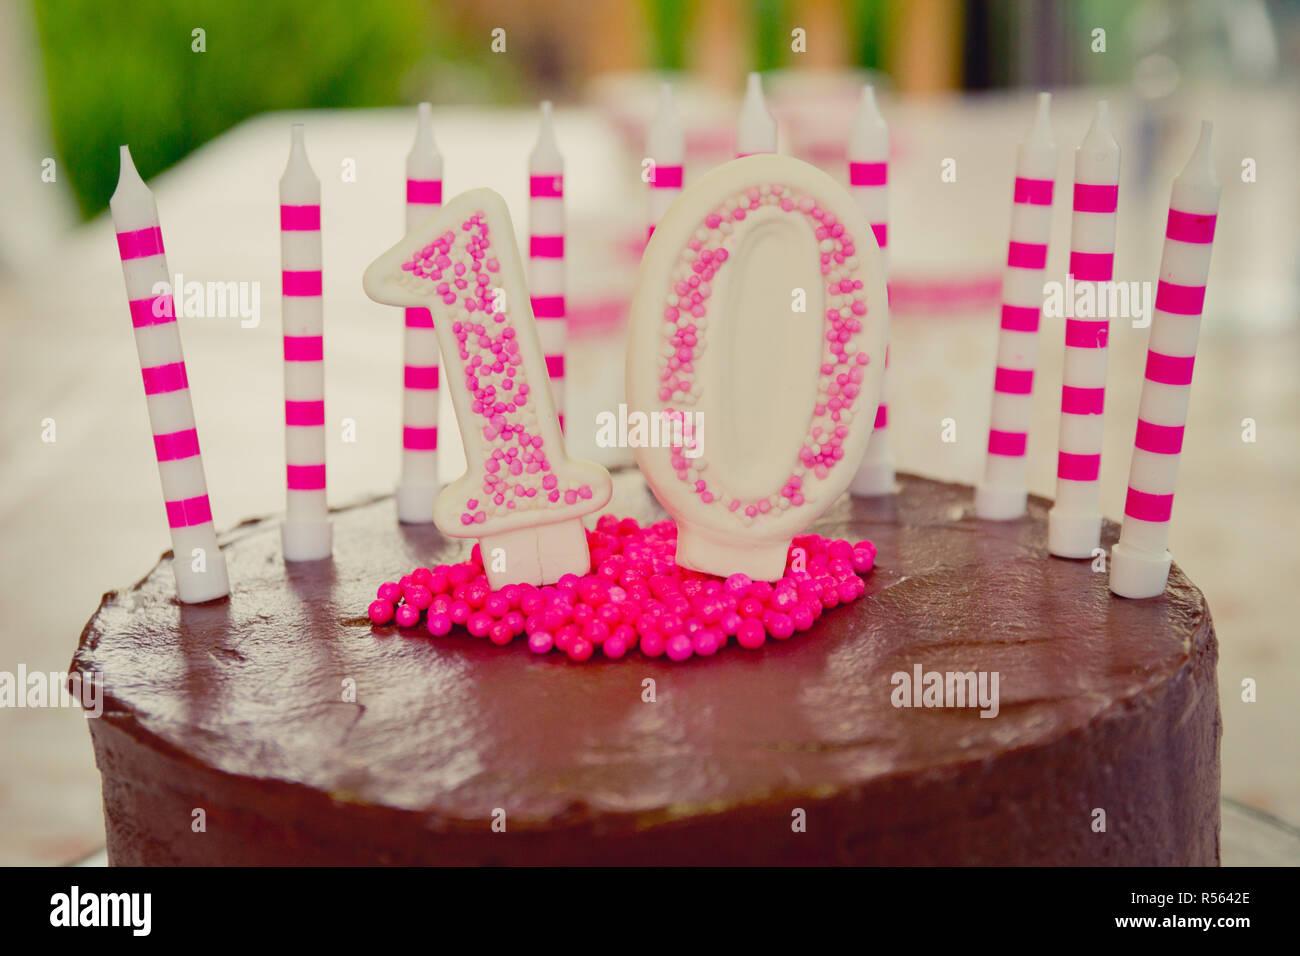 10 Geburtstag Kuchen Dekoration Stockfoto Bild 226942982 Alamy